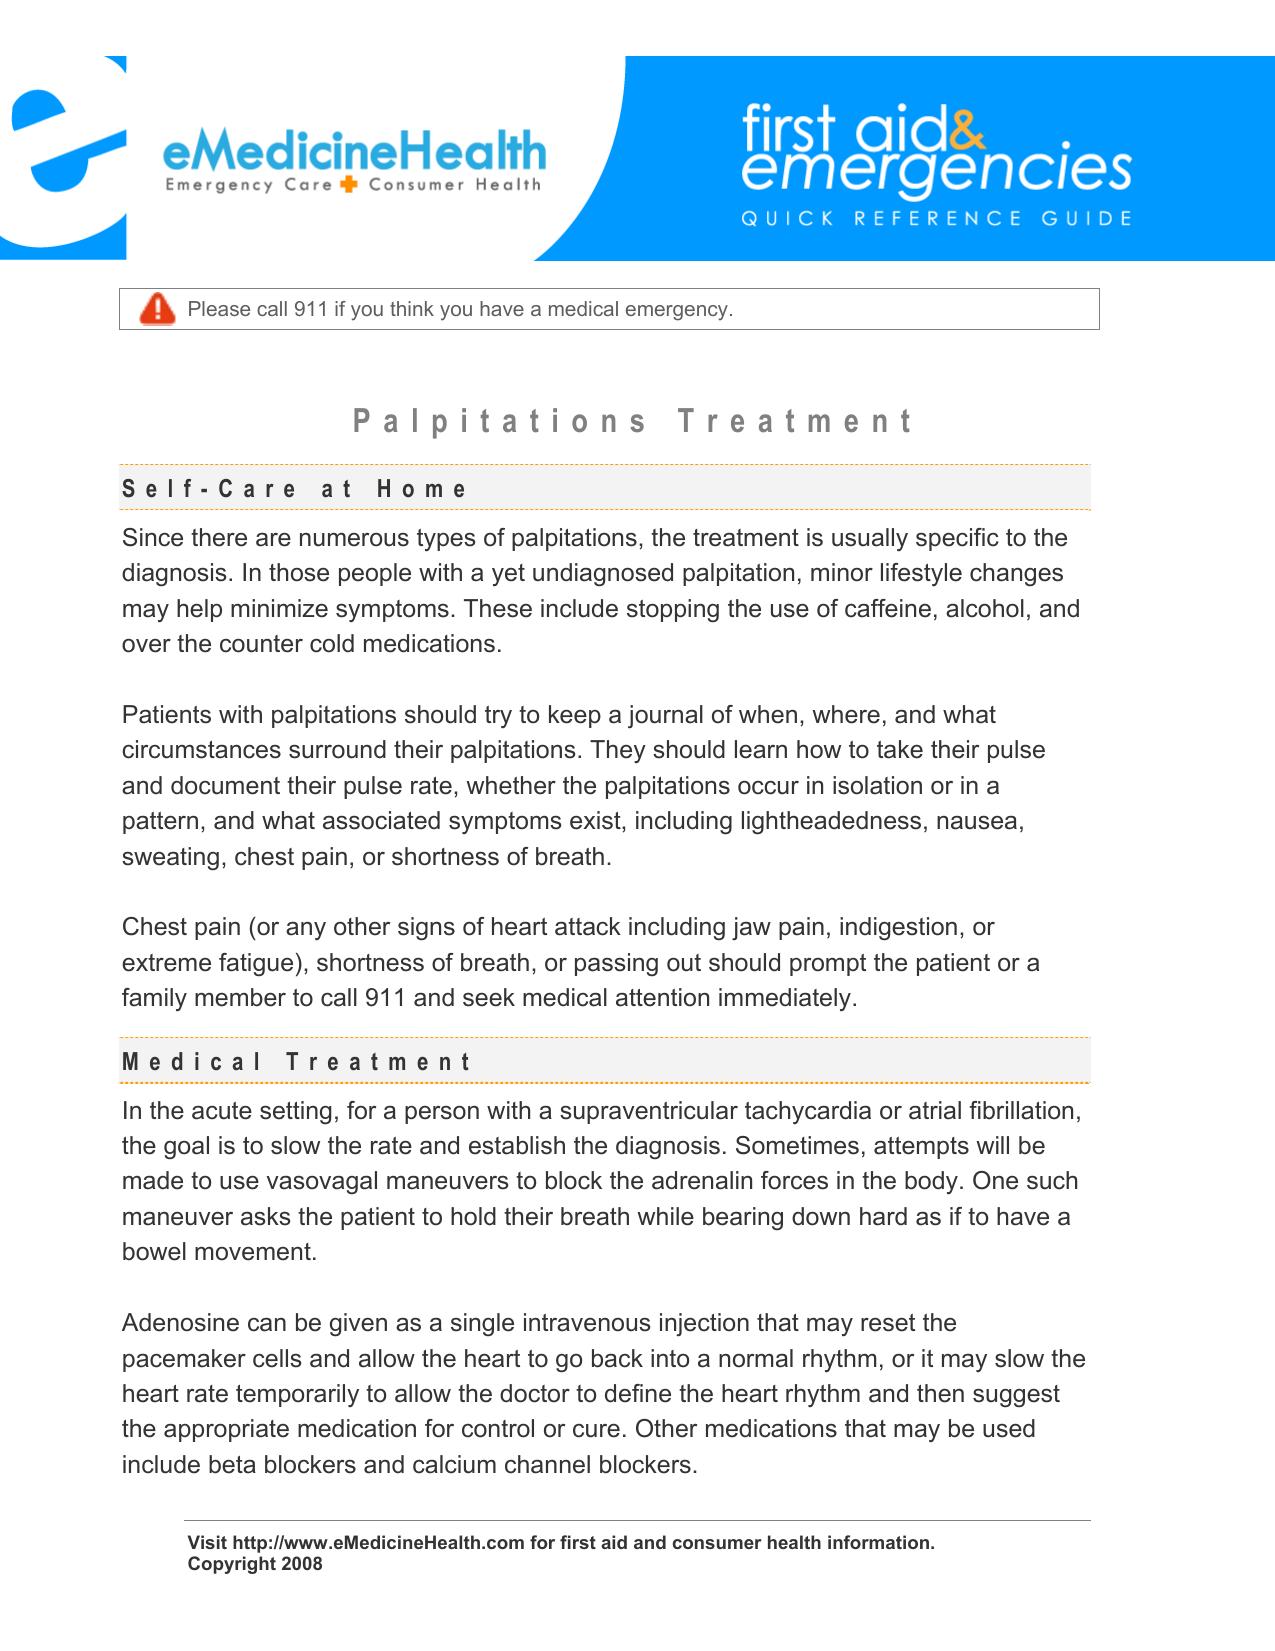 Palpitations Treatment